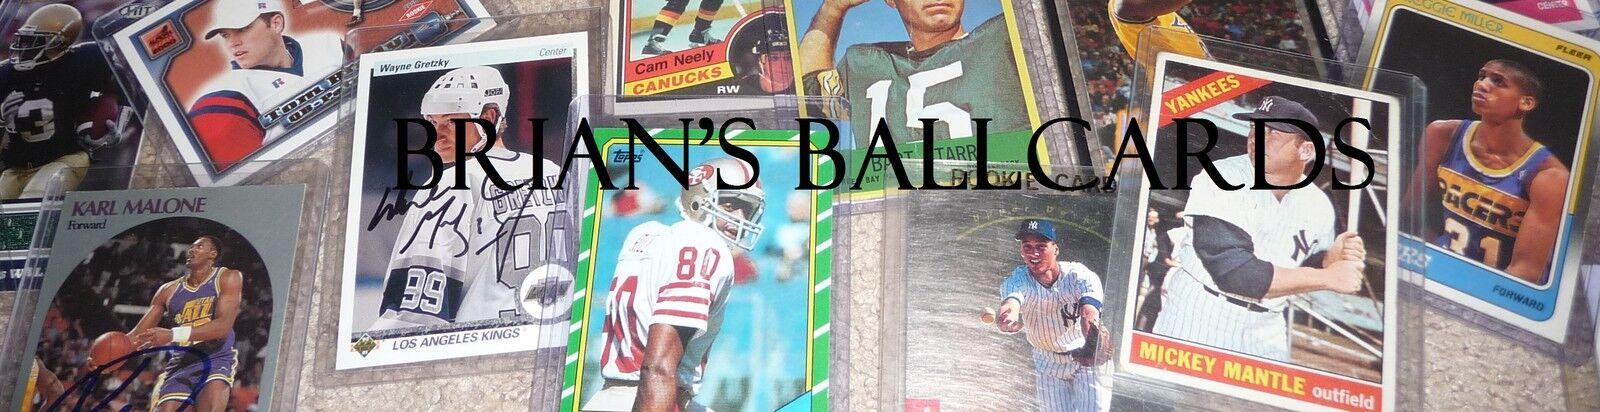 Brian's Ballcards